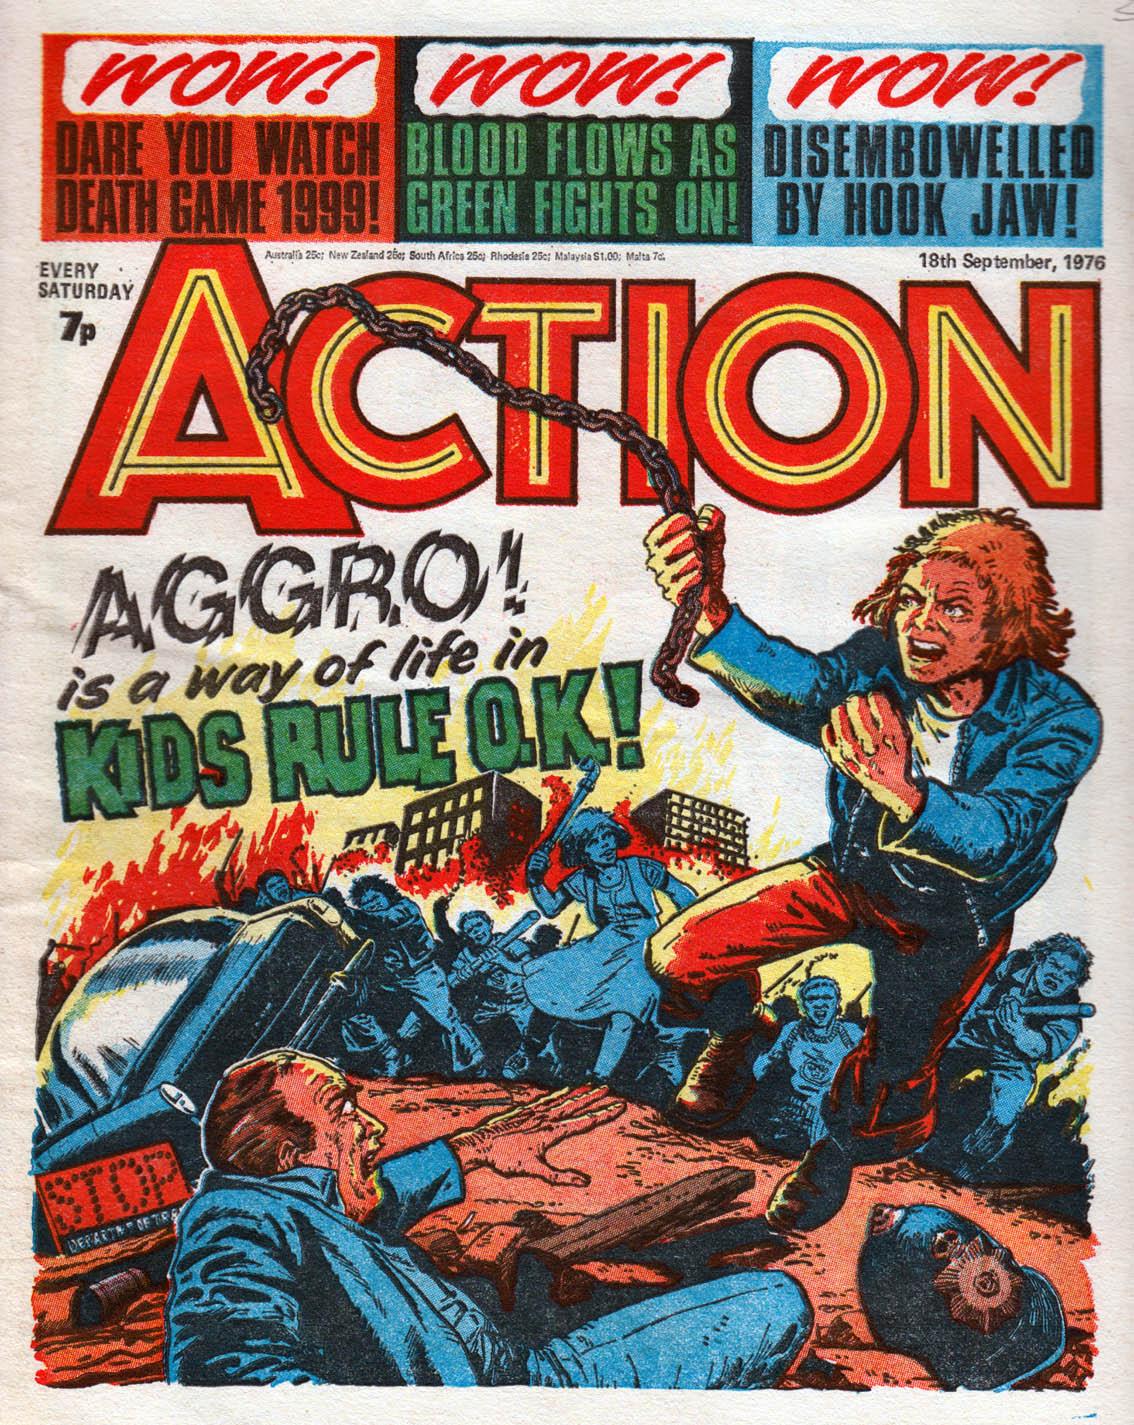 ACTION_aggro.jpg